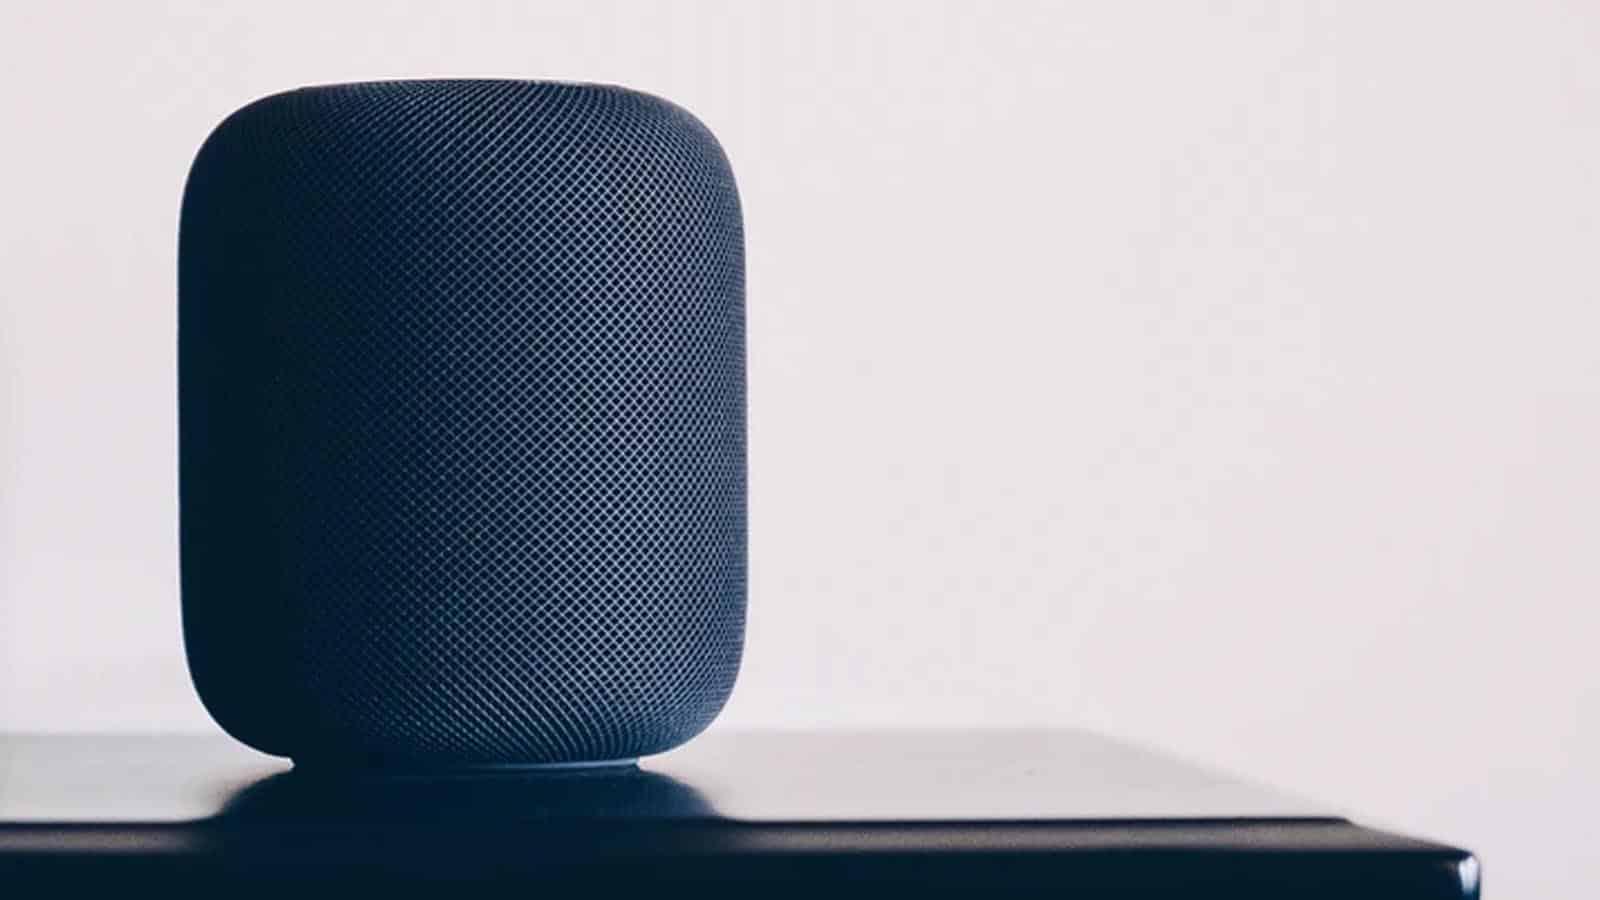 apple homepod on table